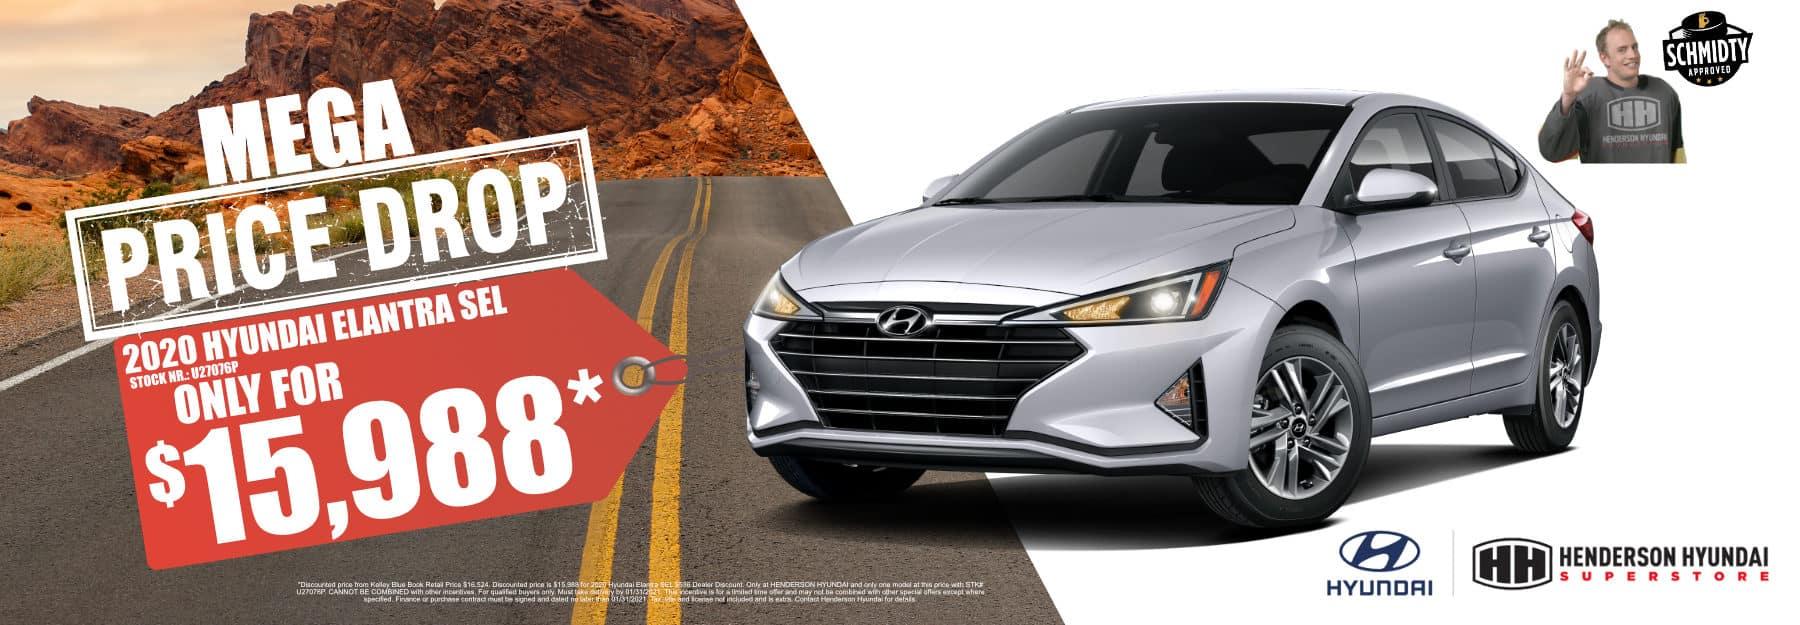 December-2020 Elantra Mega Pice Drop Henderson Hyundai